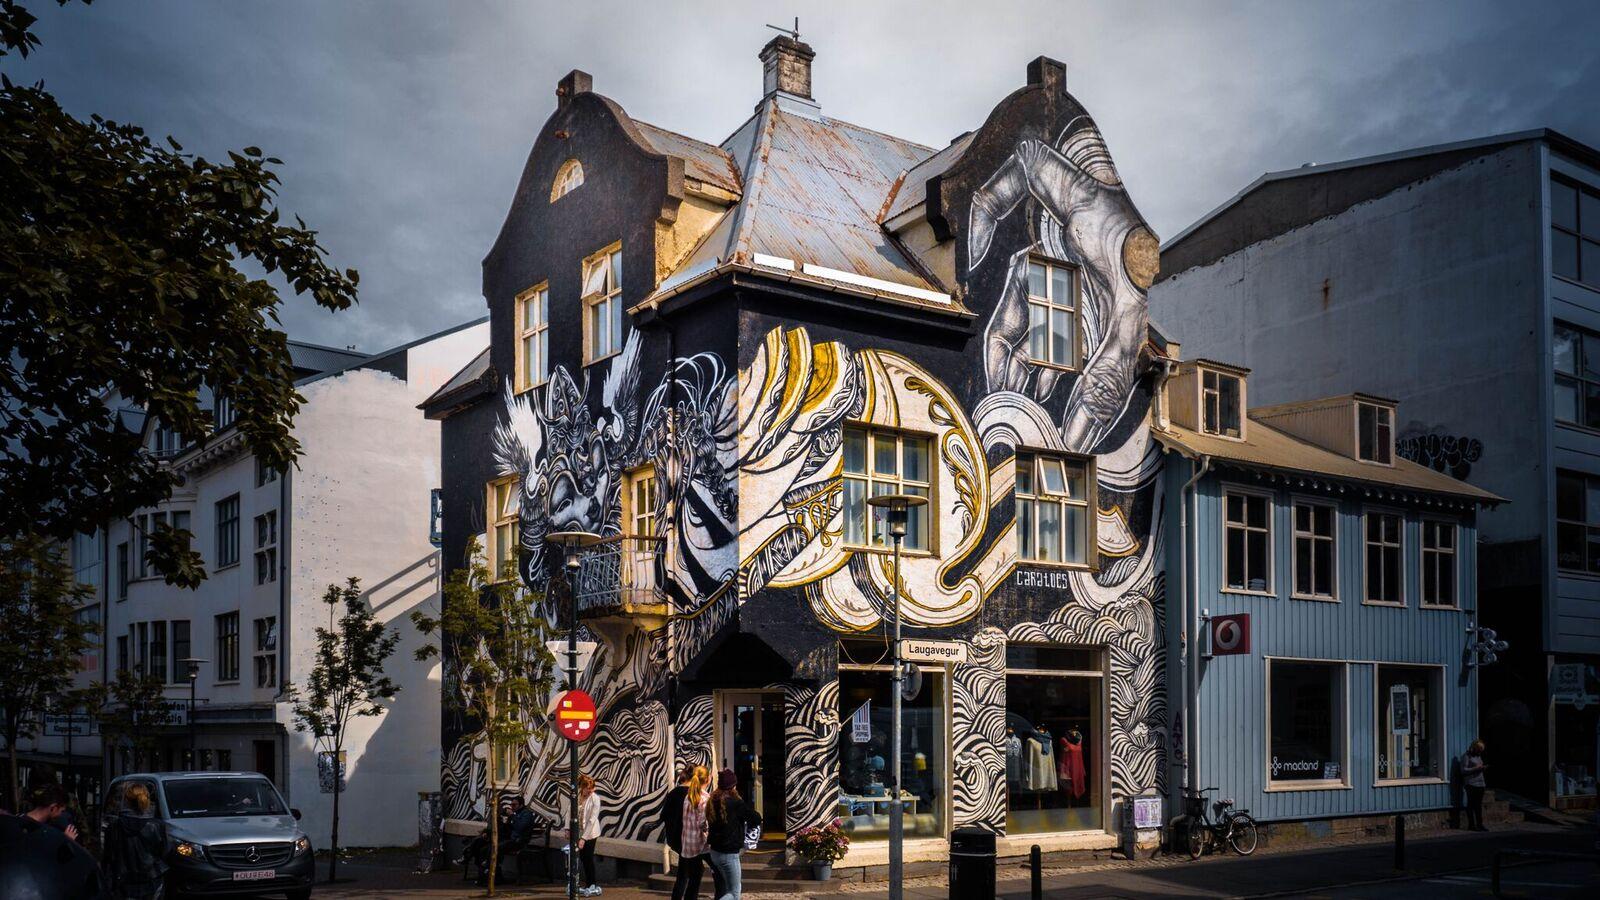 Graffiti and Street Art in Reykjavík | Guide to Iceland